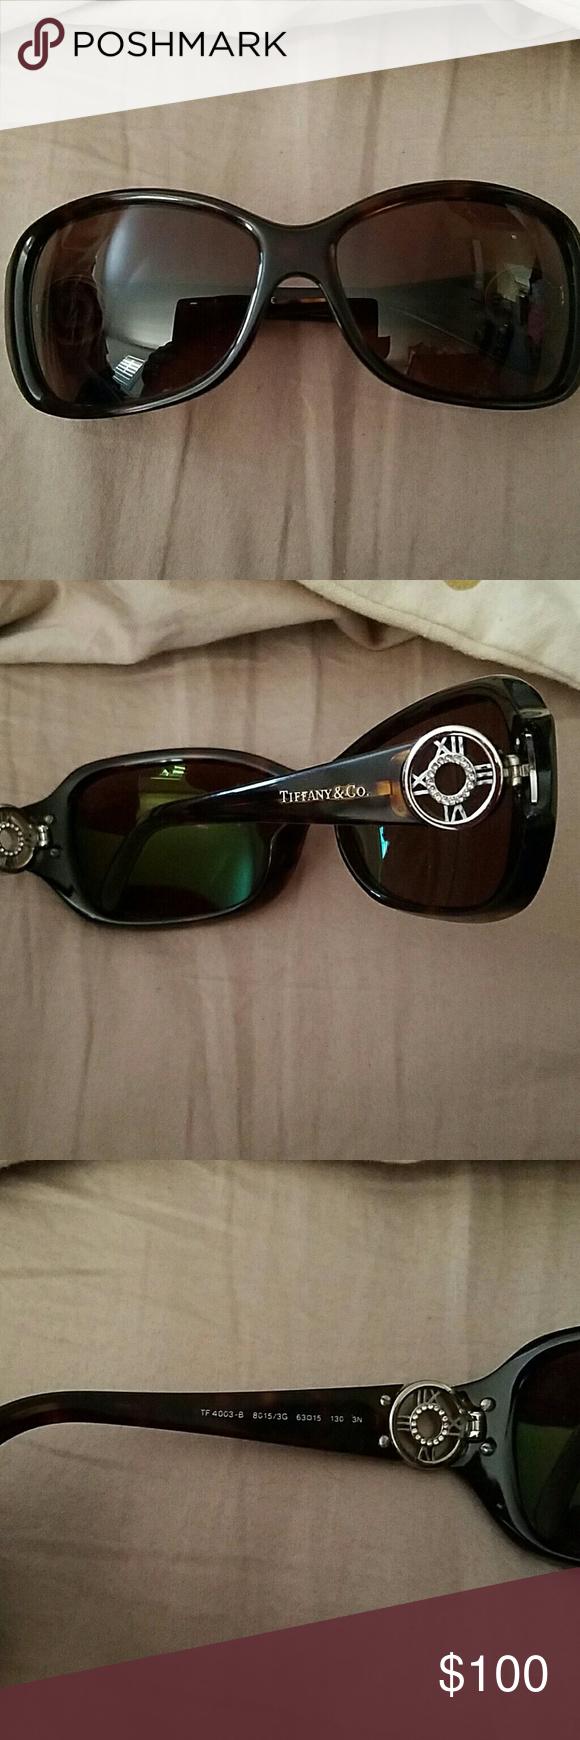 cc8ca091461 Tiffany Sunglasses Model   TF 4003-B 8015 3G used a few times no scratches  no case Tiffany   Co. Accessories Glasses